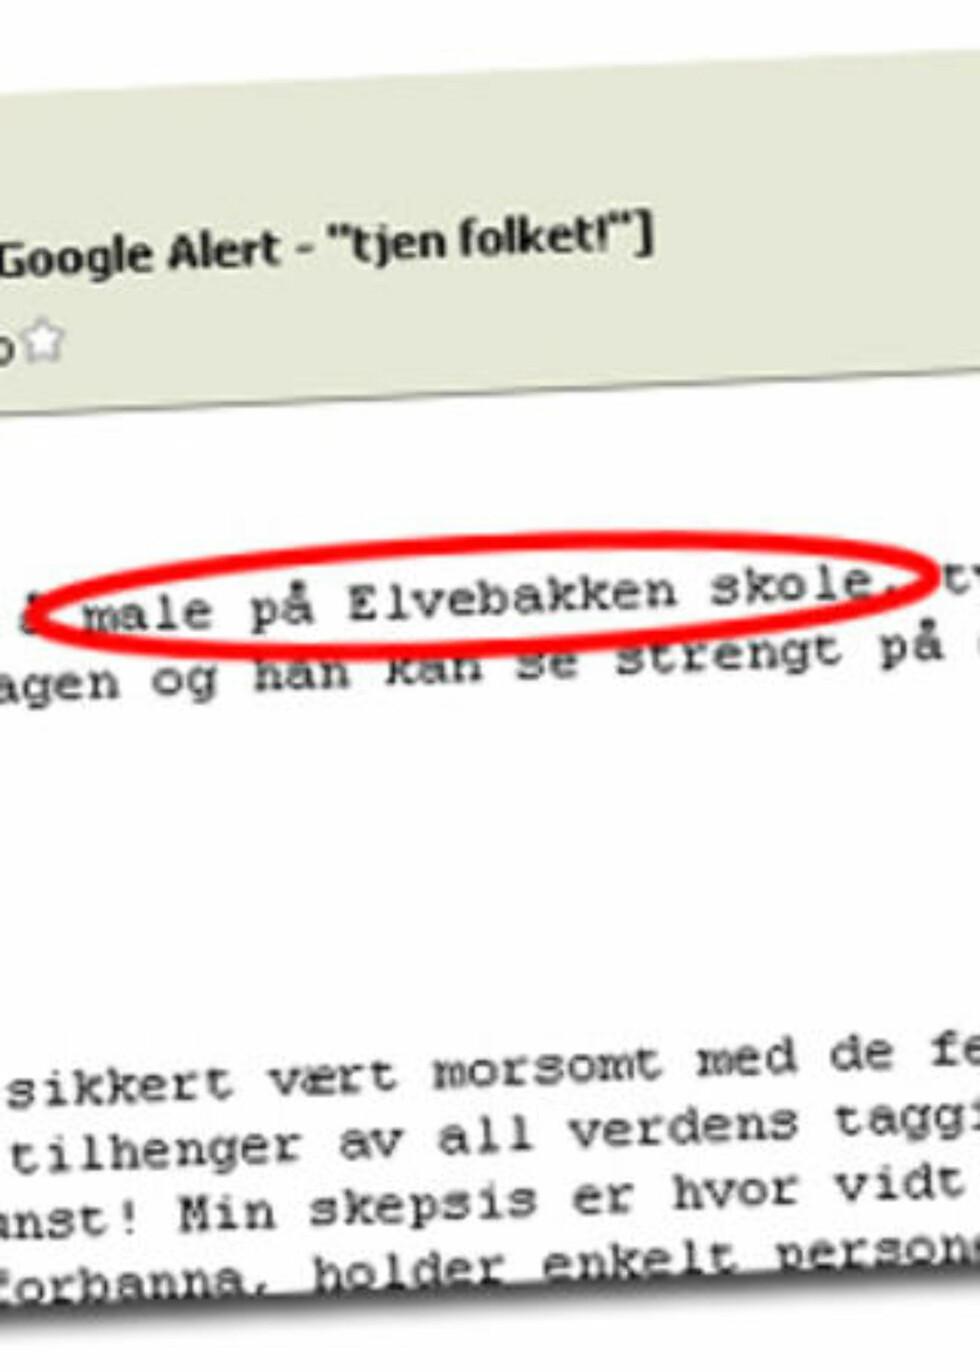 BA OM TAGGING PÅ OSLO-SKOLE: En e-post fra aliaset Joe ba om at det ble tagget på Elvebakken skole i Oslo. Faksimile: Dagbladet